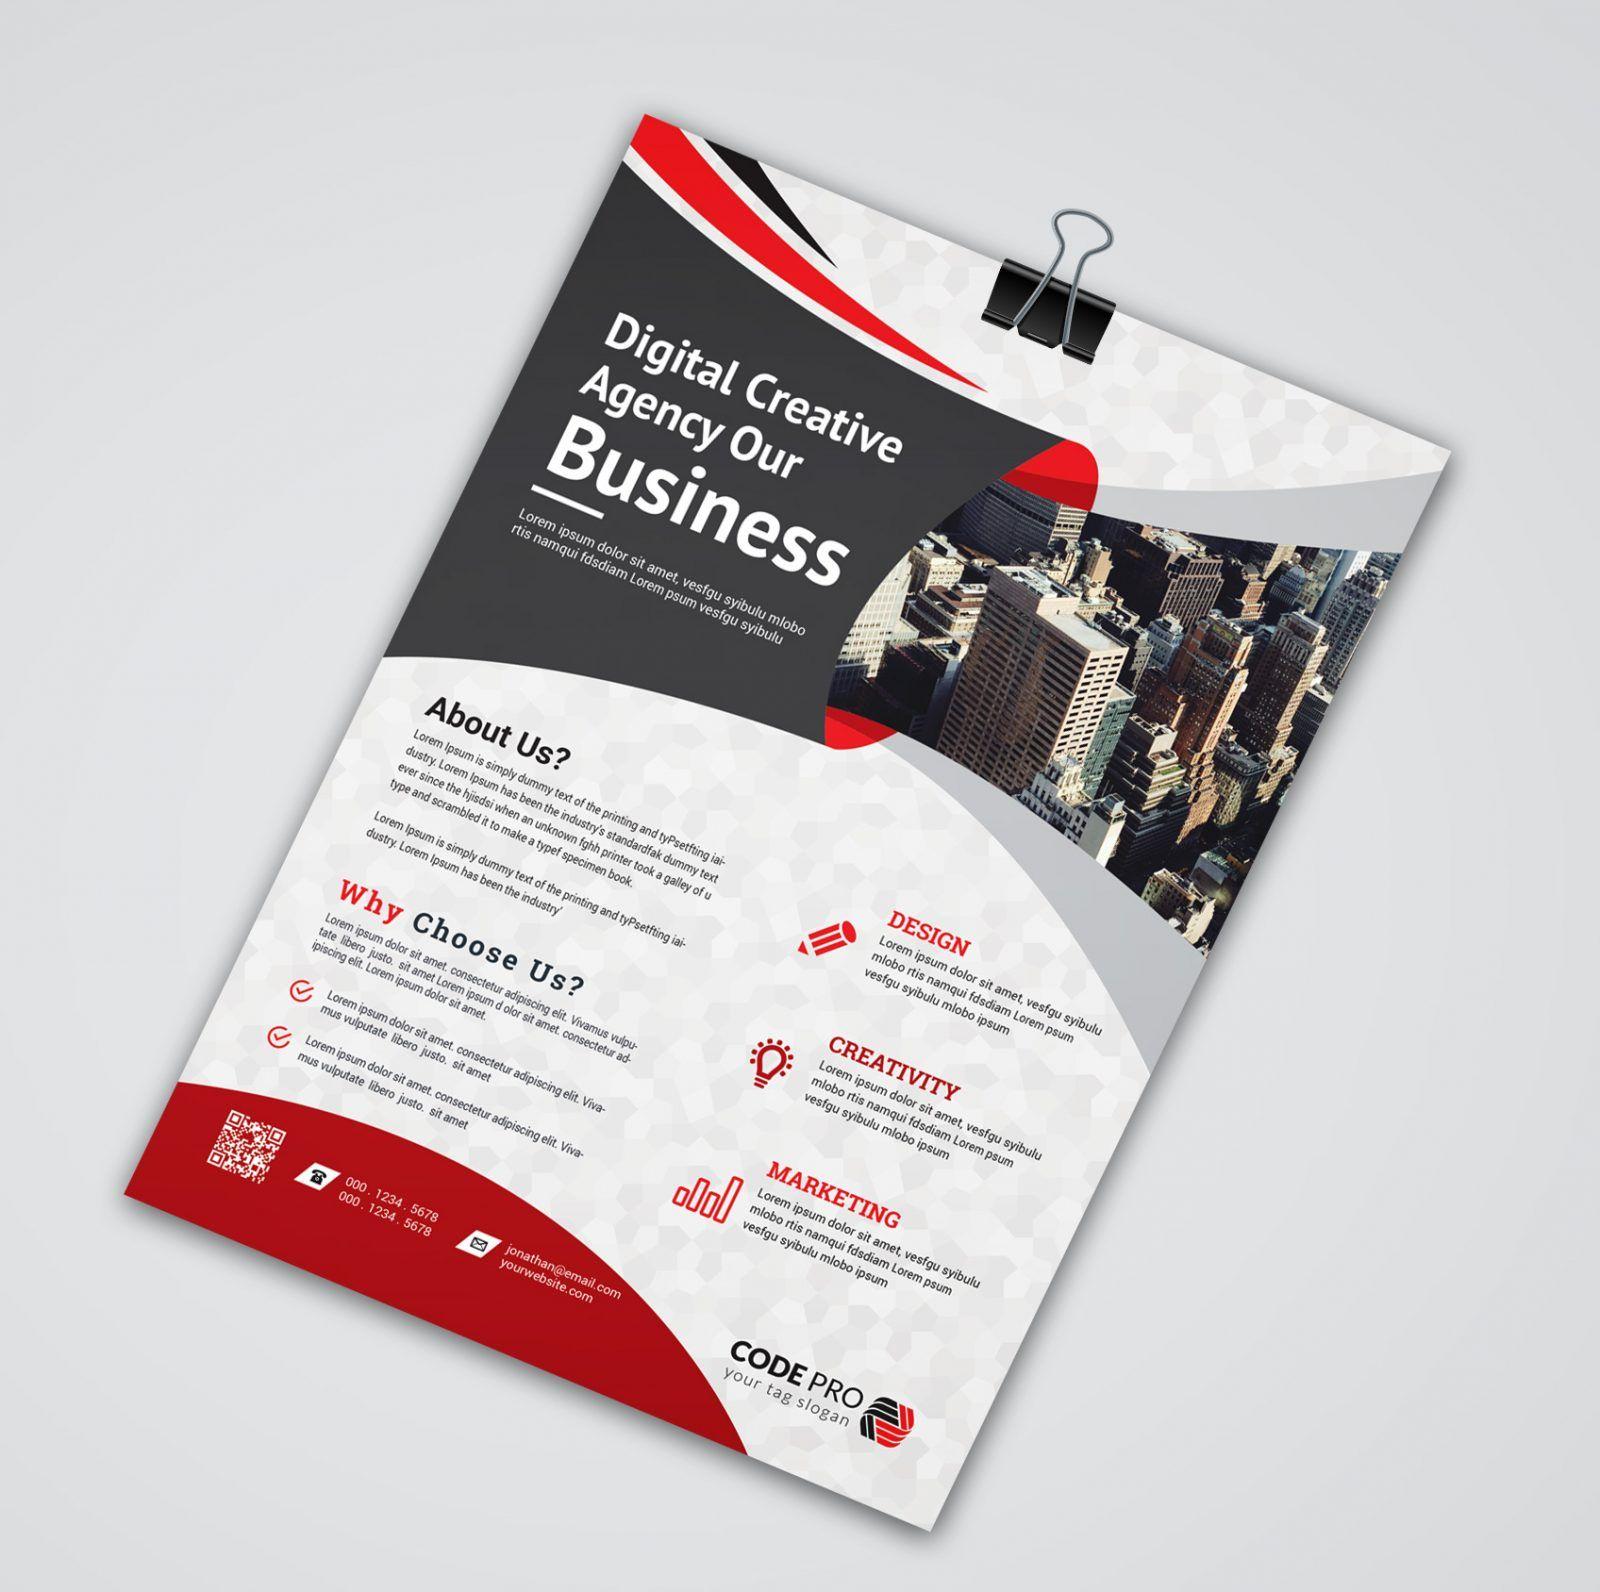 Brussels Creative Business Flyer Design Template 001637